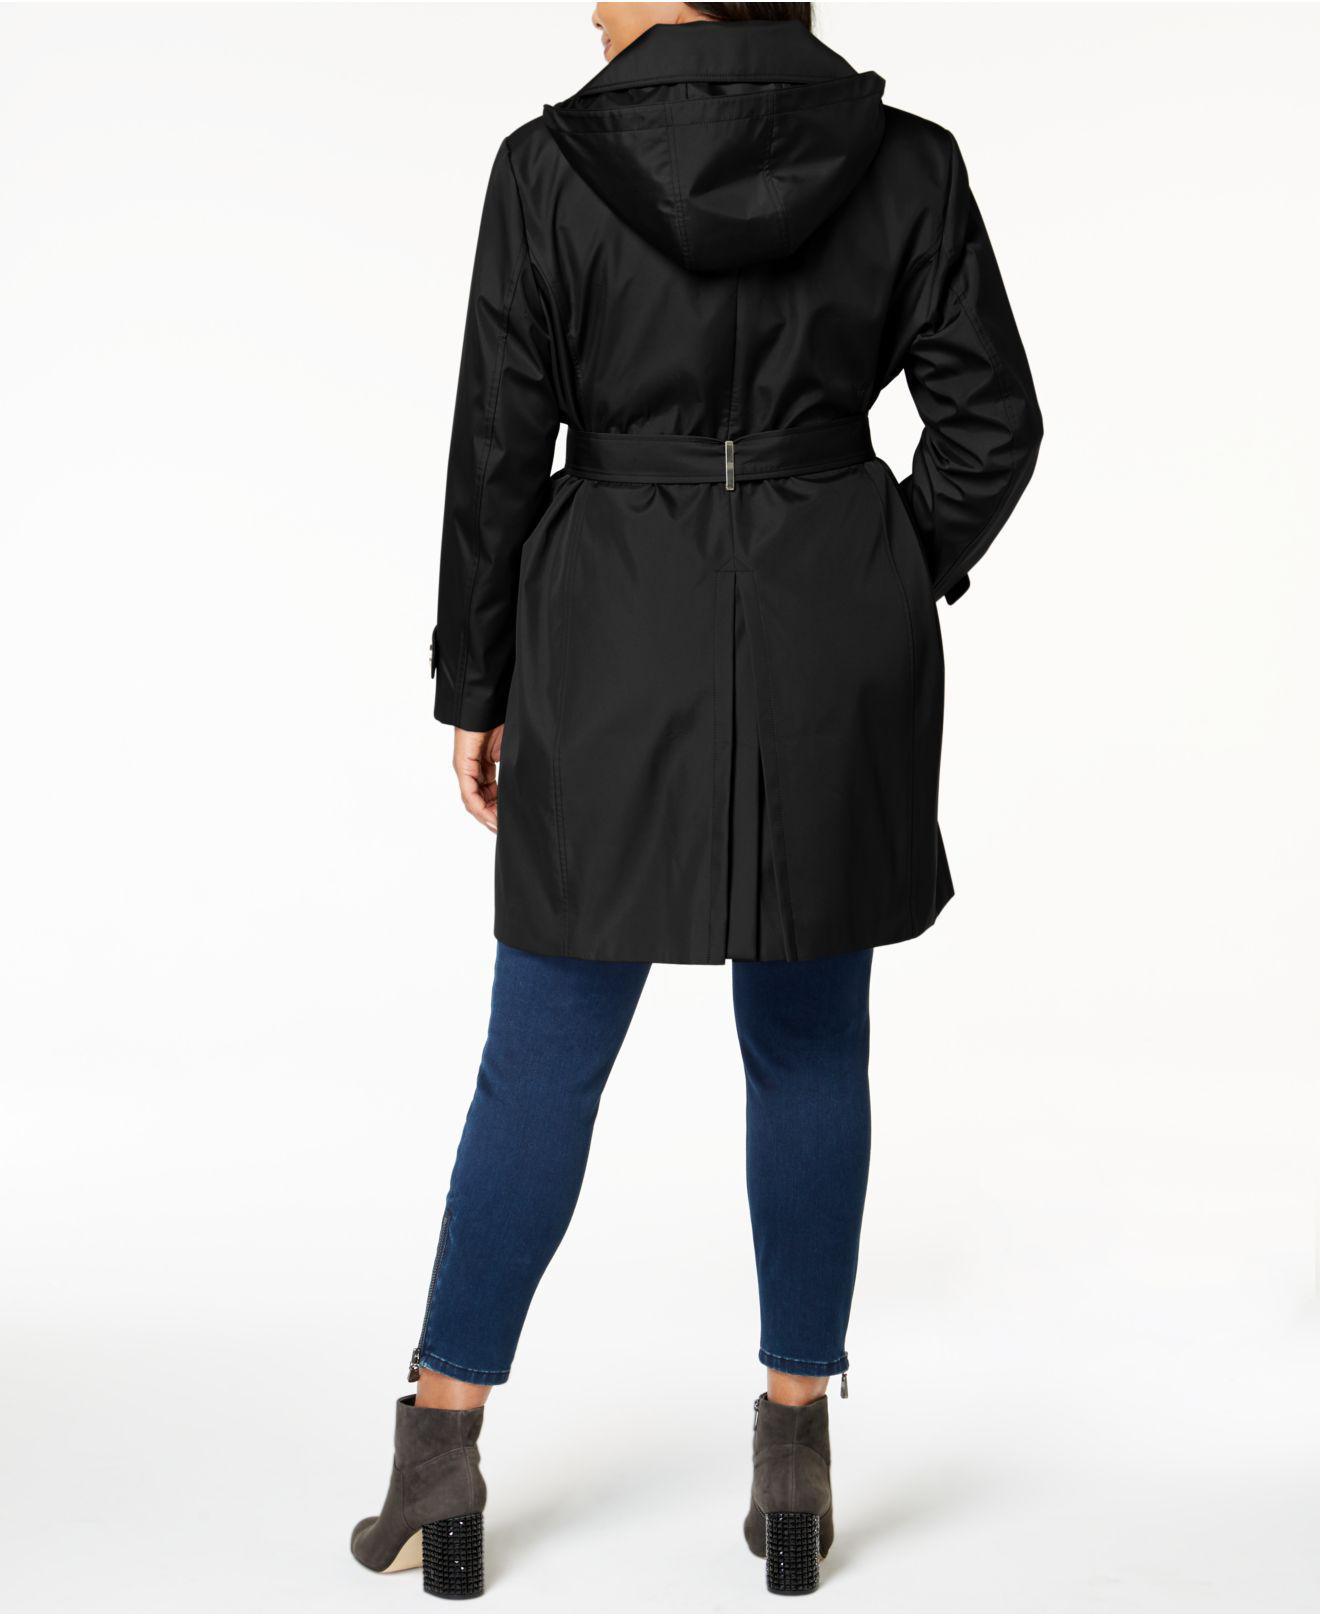 30039aee7d8ec Lyst - Calvin Klein Plus Size Waterproof Trench Coat in Black